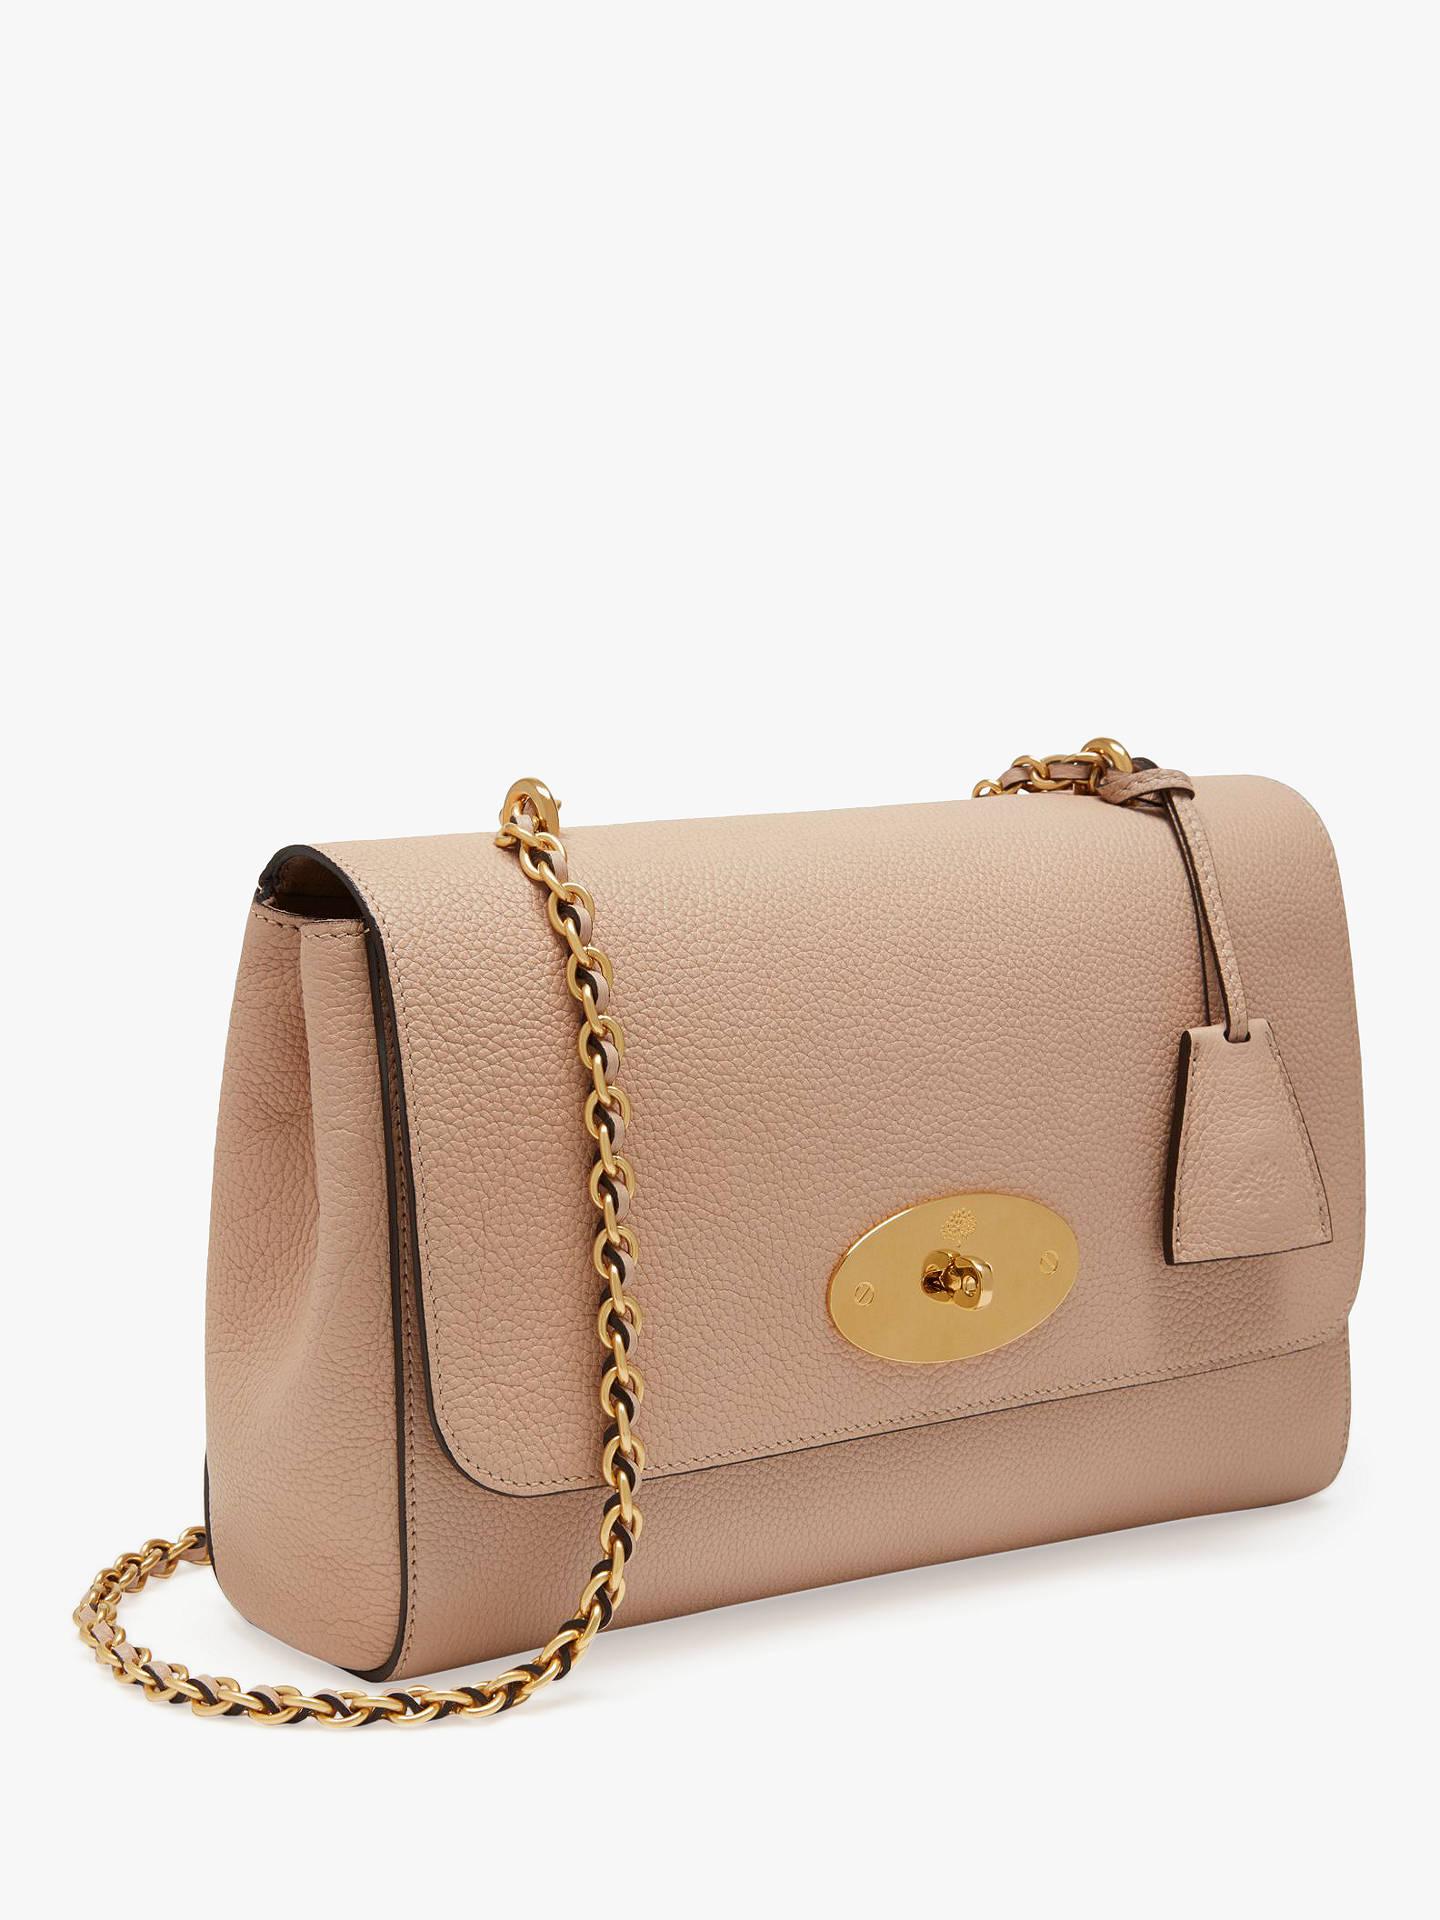 9ebd91ef5452 Mulberry Medium Lily Classic Grain Leather Shoulder Bag at John ...